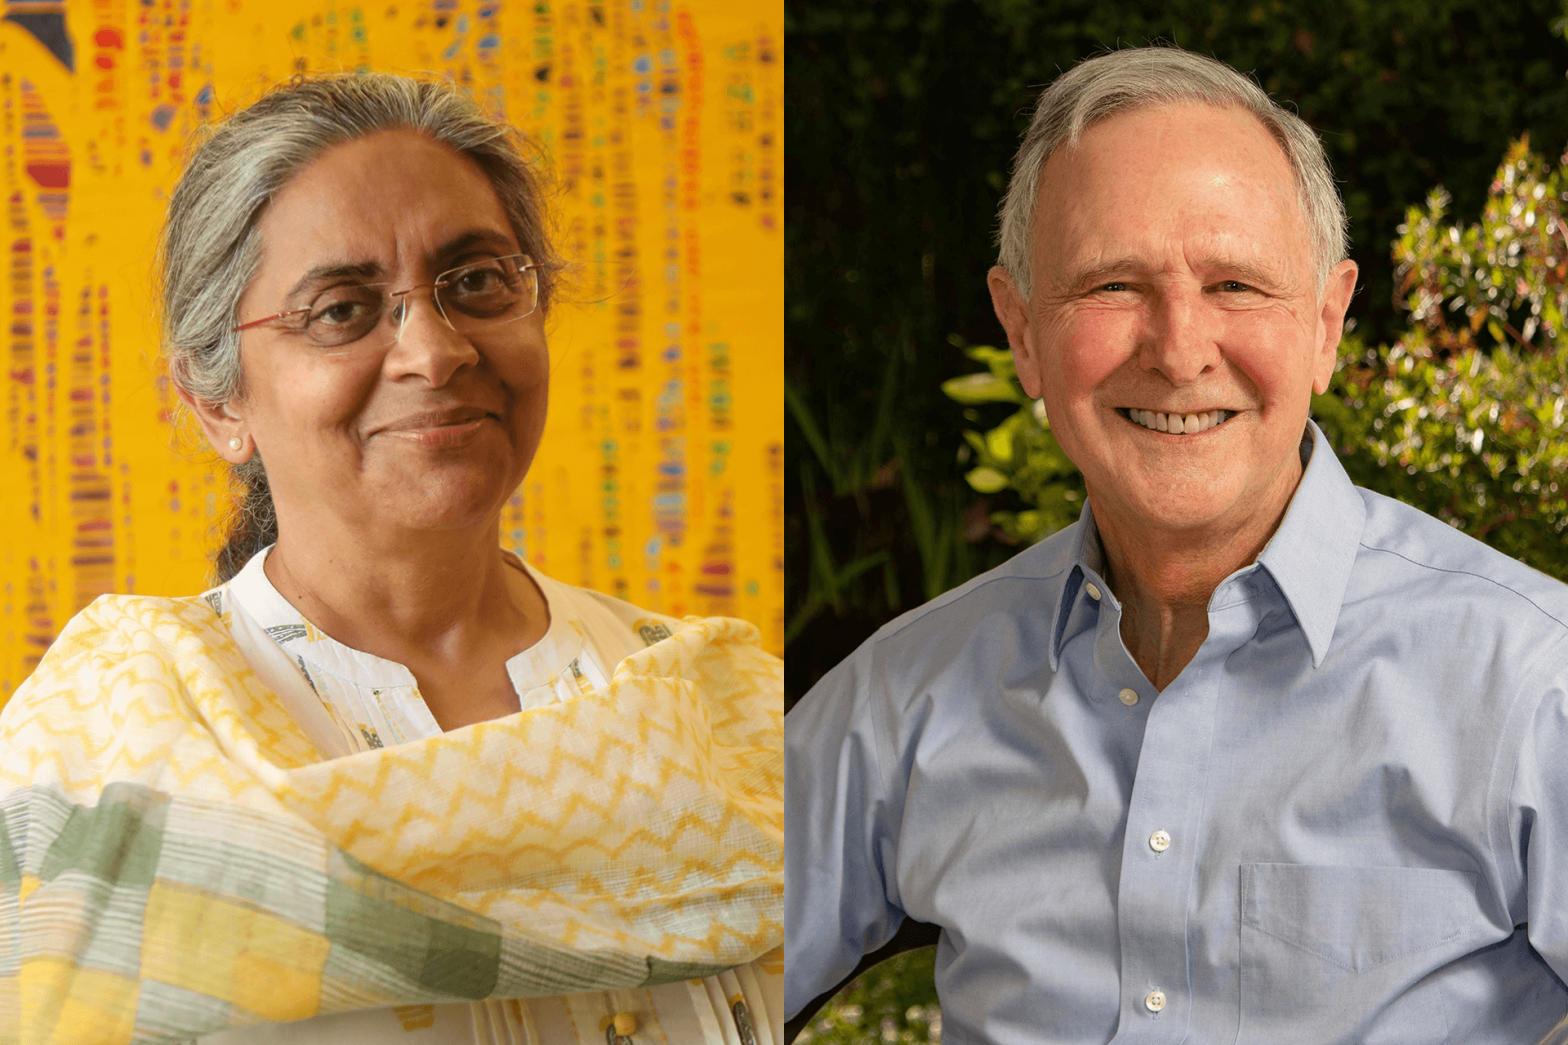 Prof Eric Hanushek and Dr. Rukmini Banerji awarded the 2021 Yidan Prize_40.1